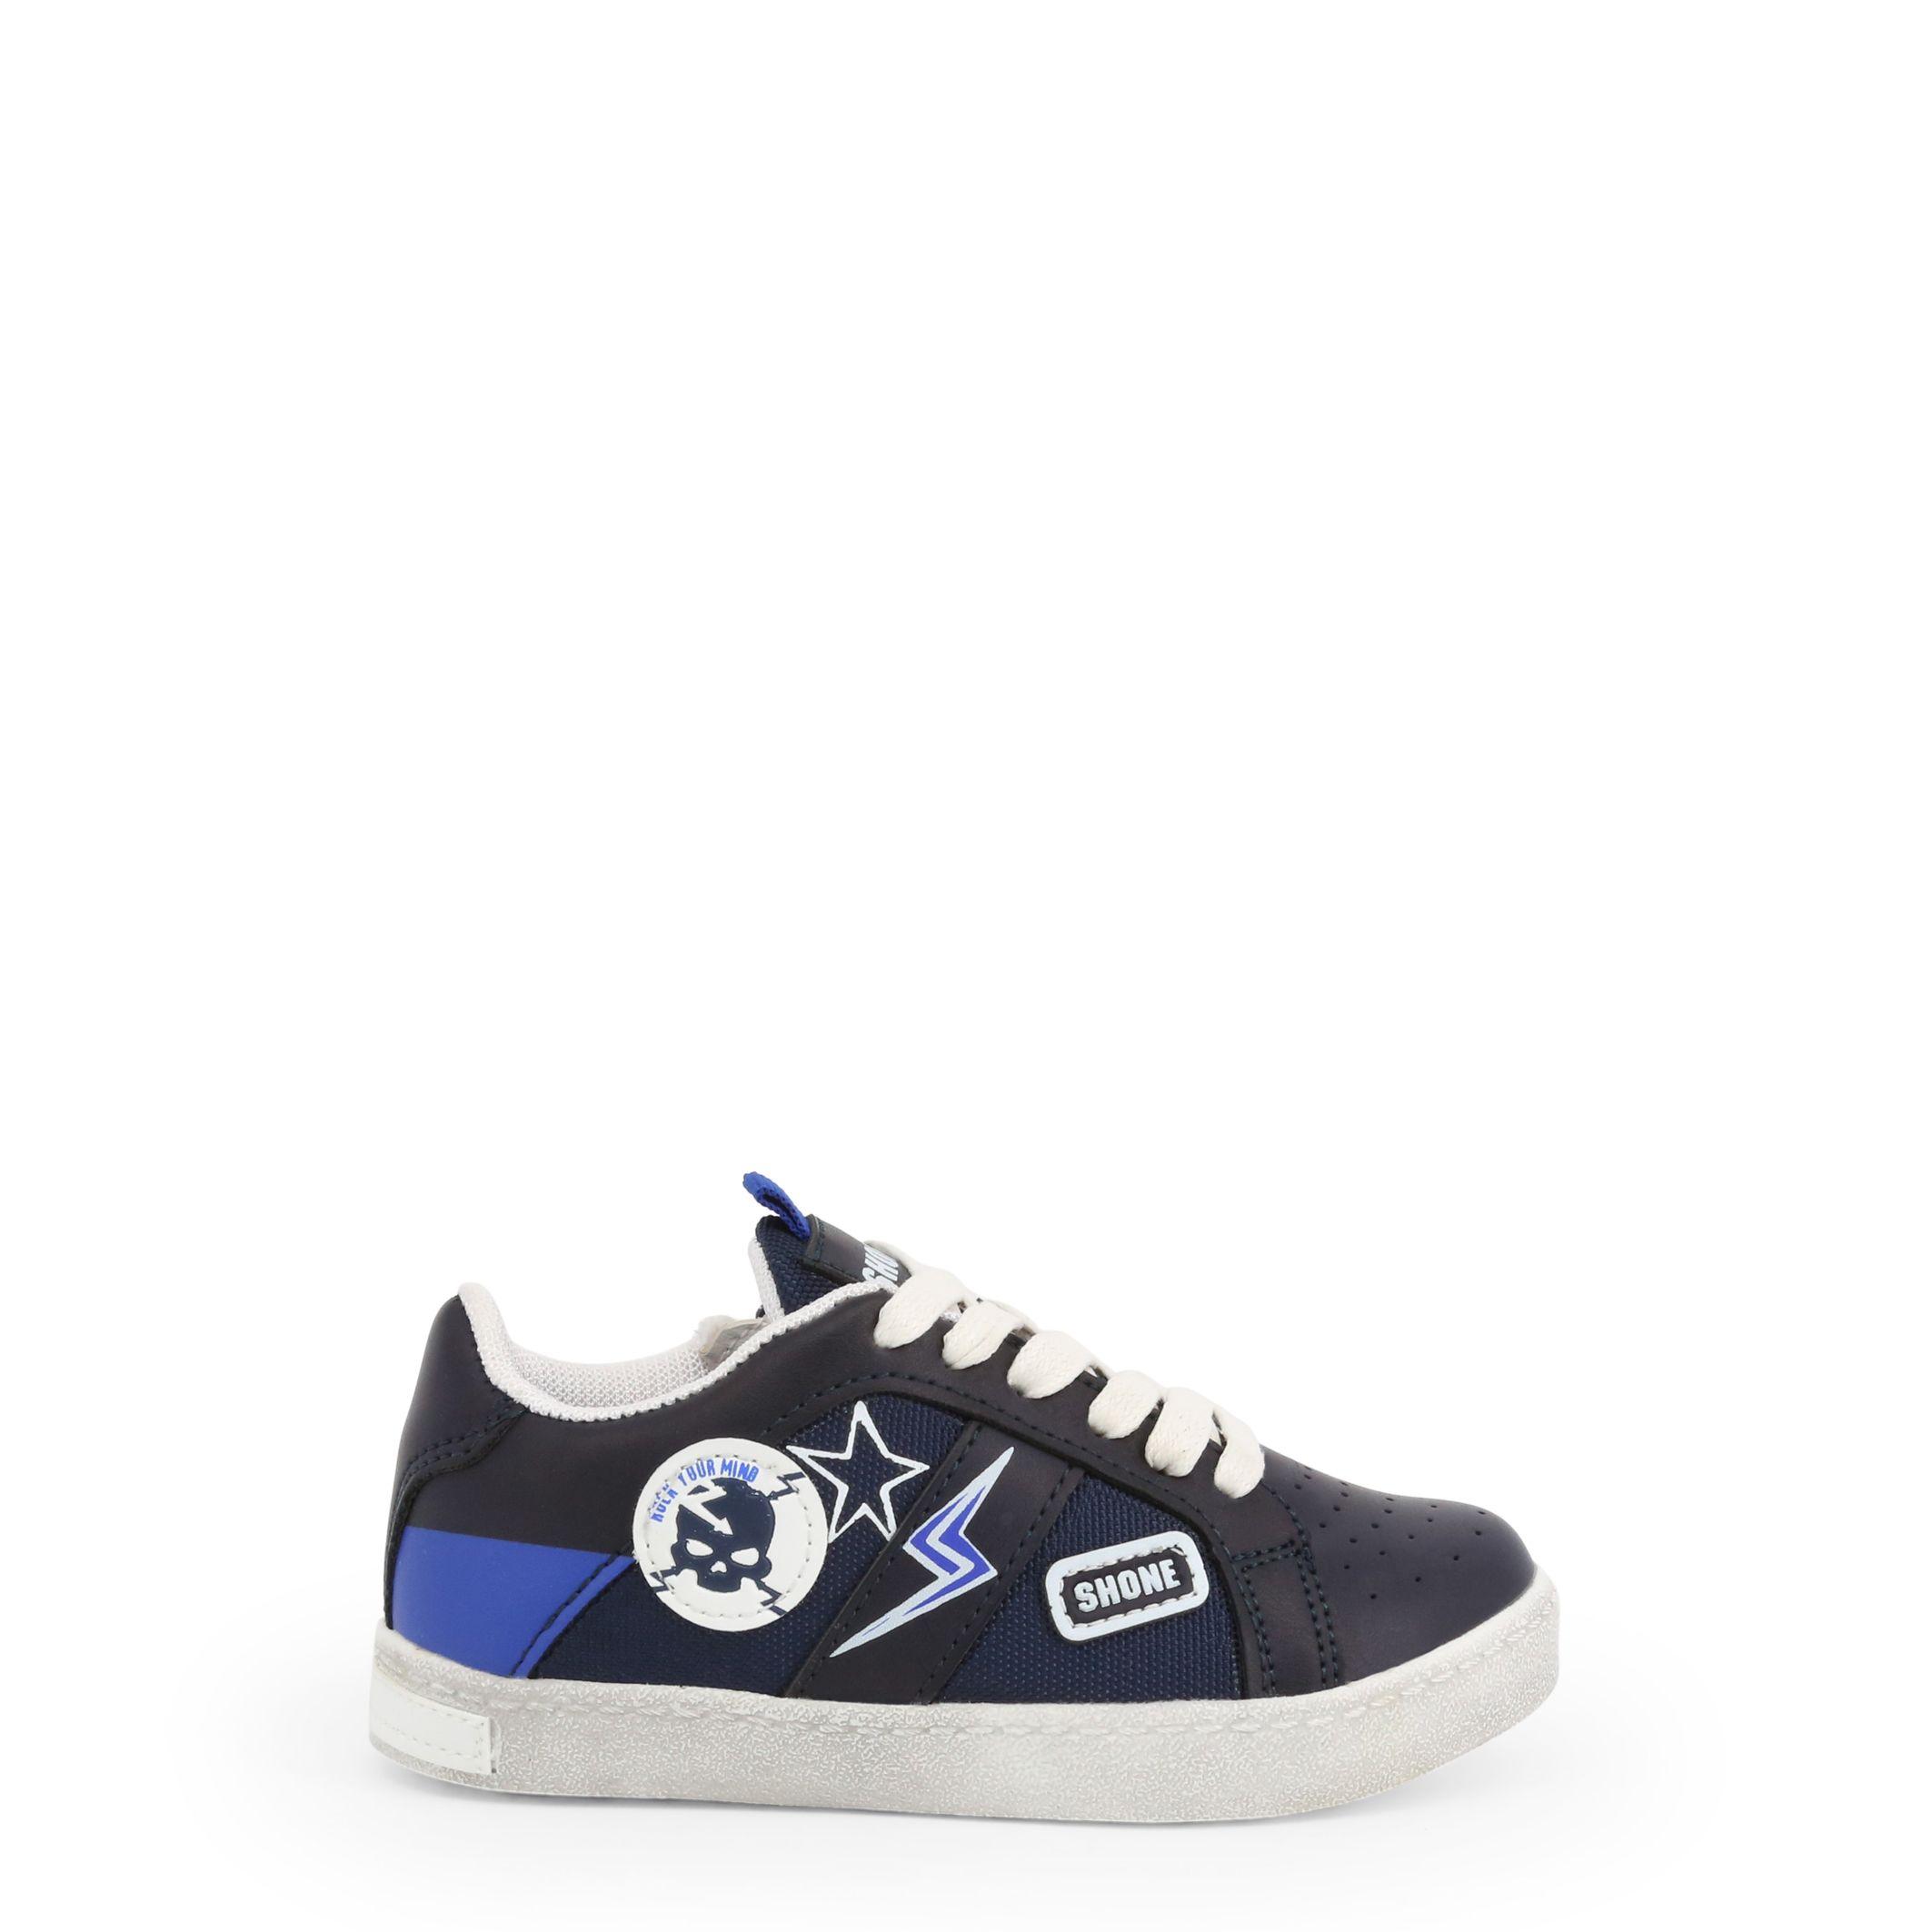 Sneakers Shone – 200-085